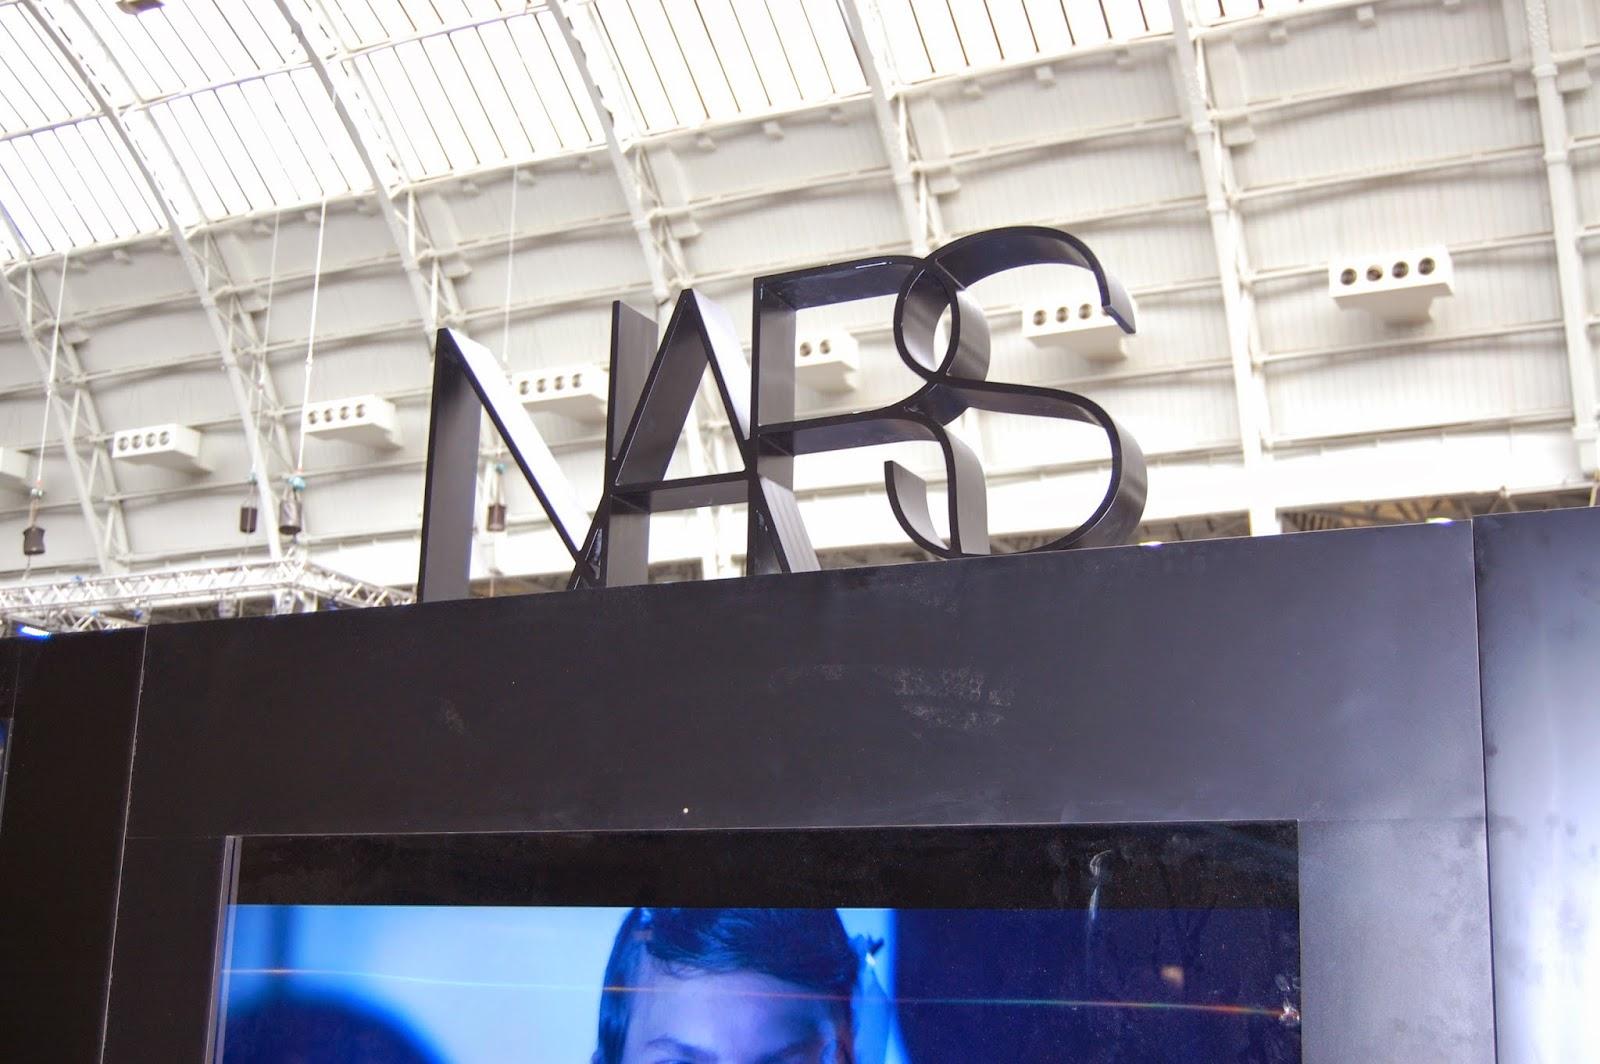 IMATS-London-2014